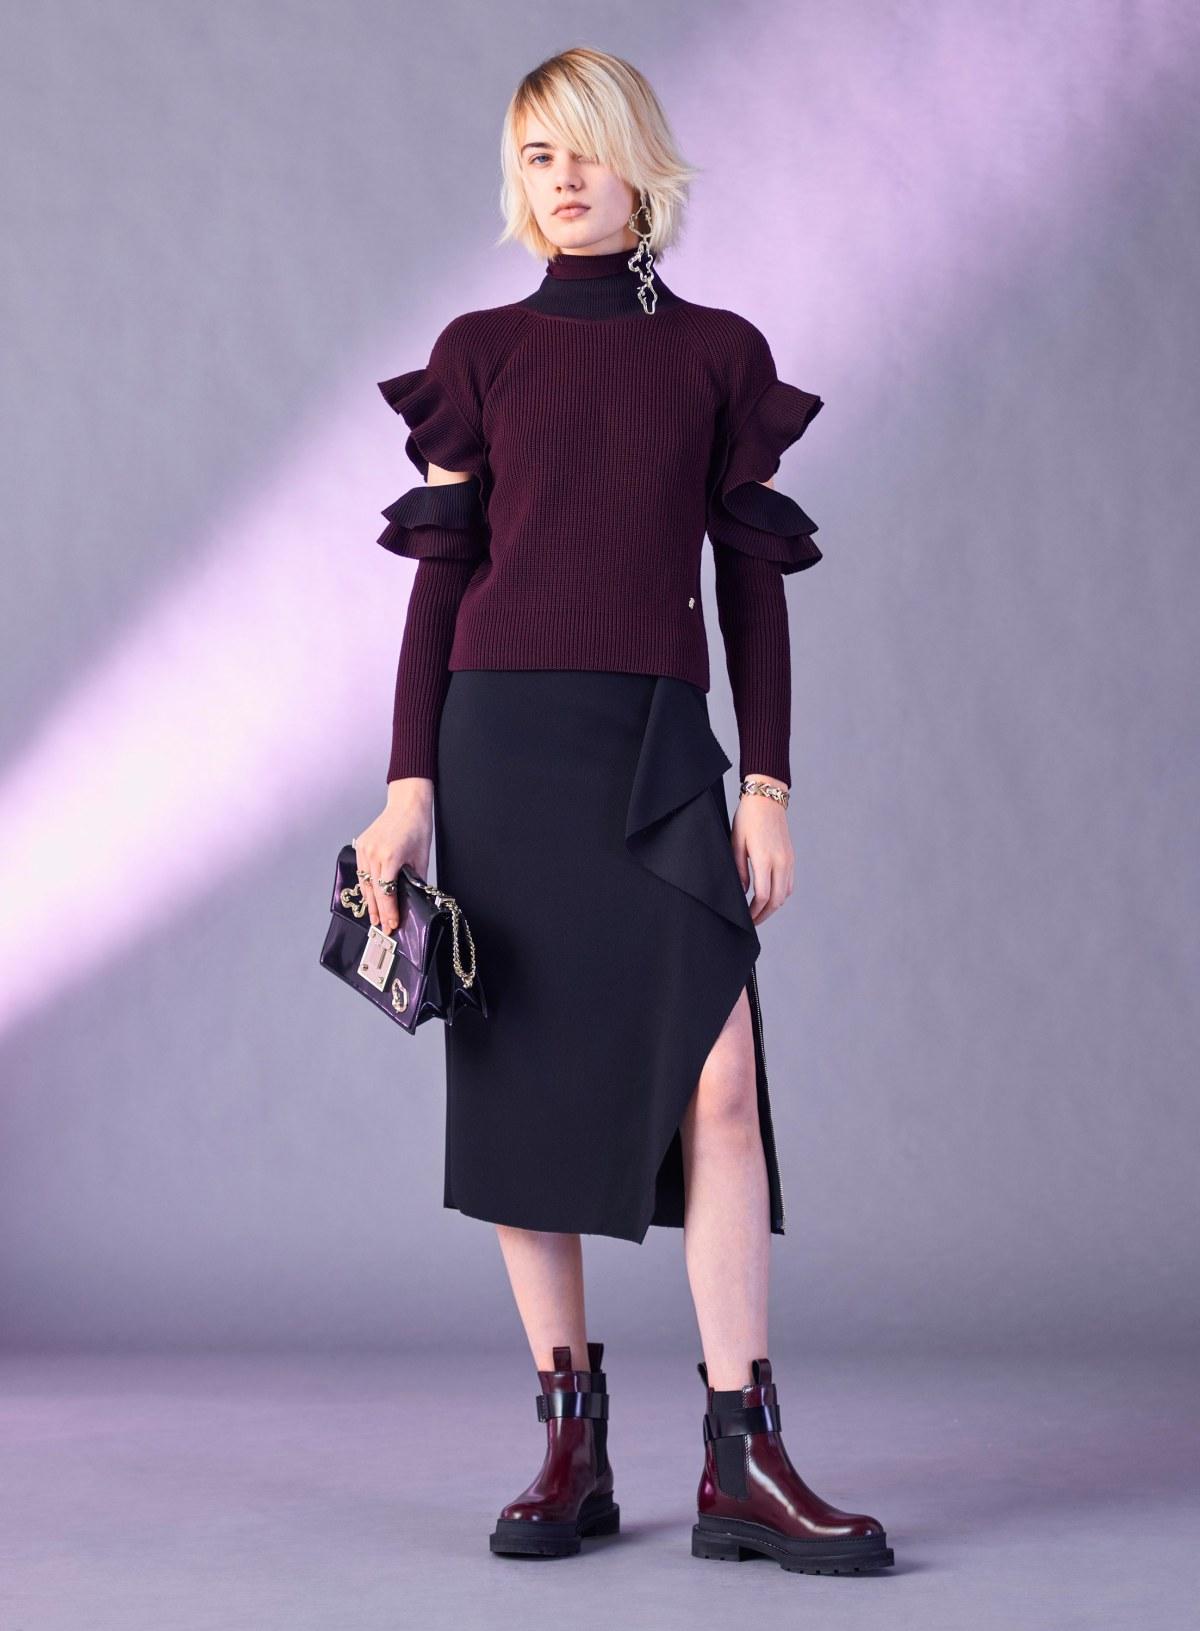 versace-pre-fall-2017-fashion-show-the-impression-19